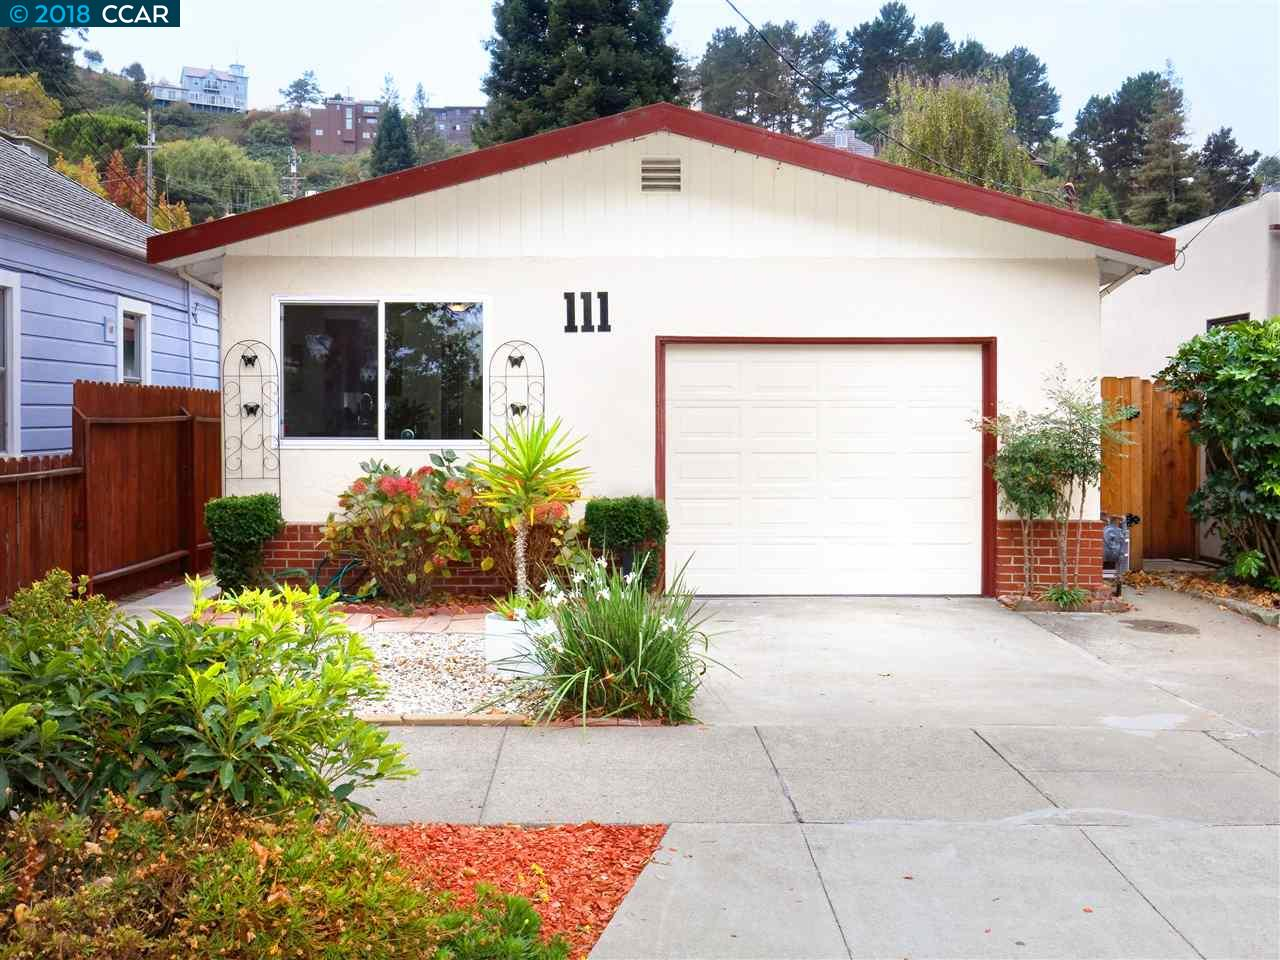 111 E RICHMOND AVE, RICHMOND, CA 94801